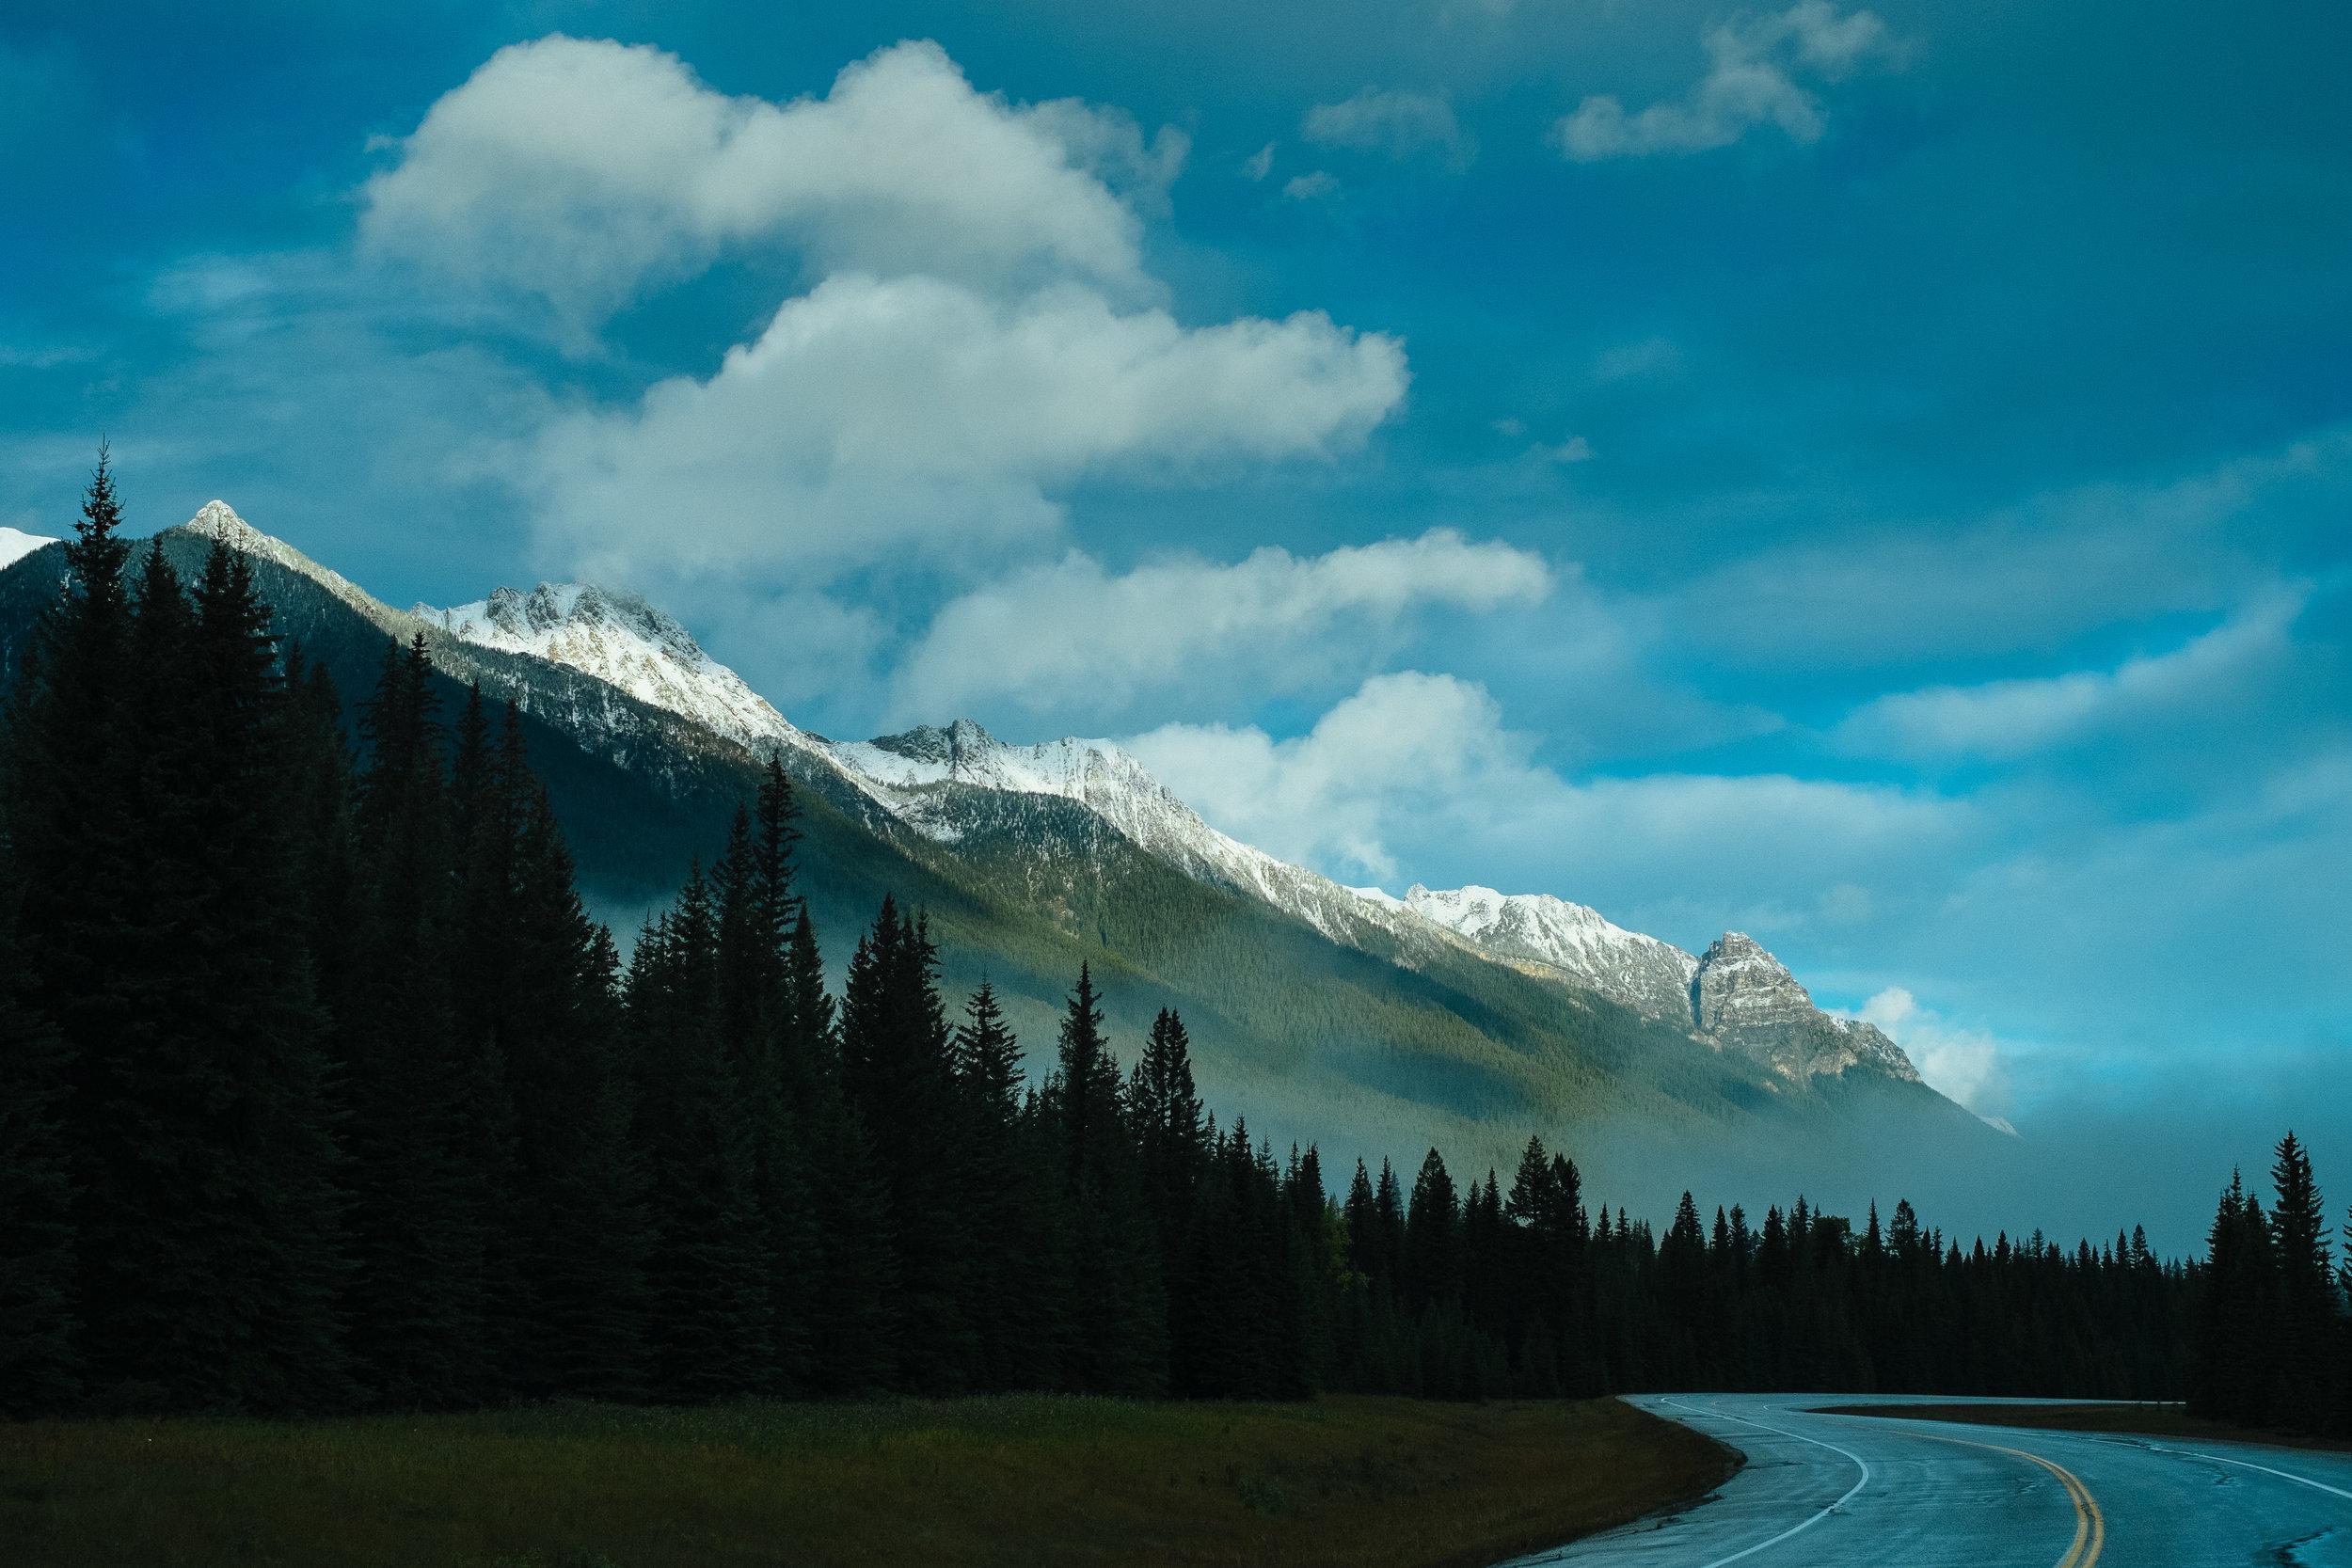 Rocky Mountains,  Canada , X-Pro1, XF 35mm f/1.4 R @ f/4